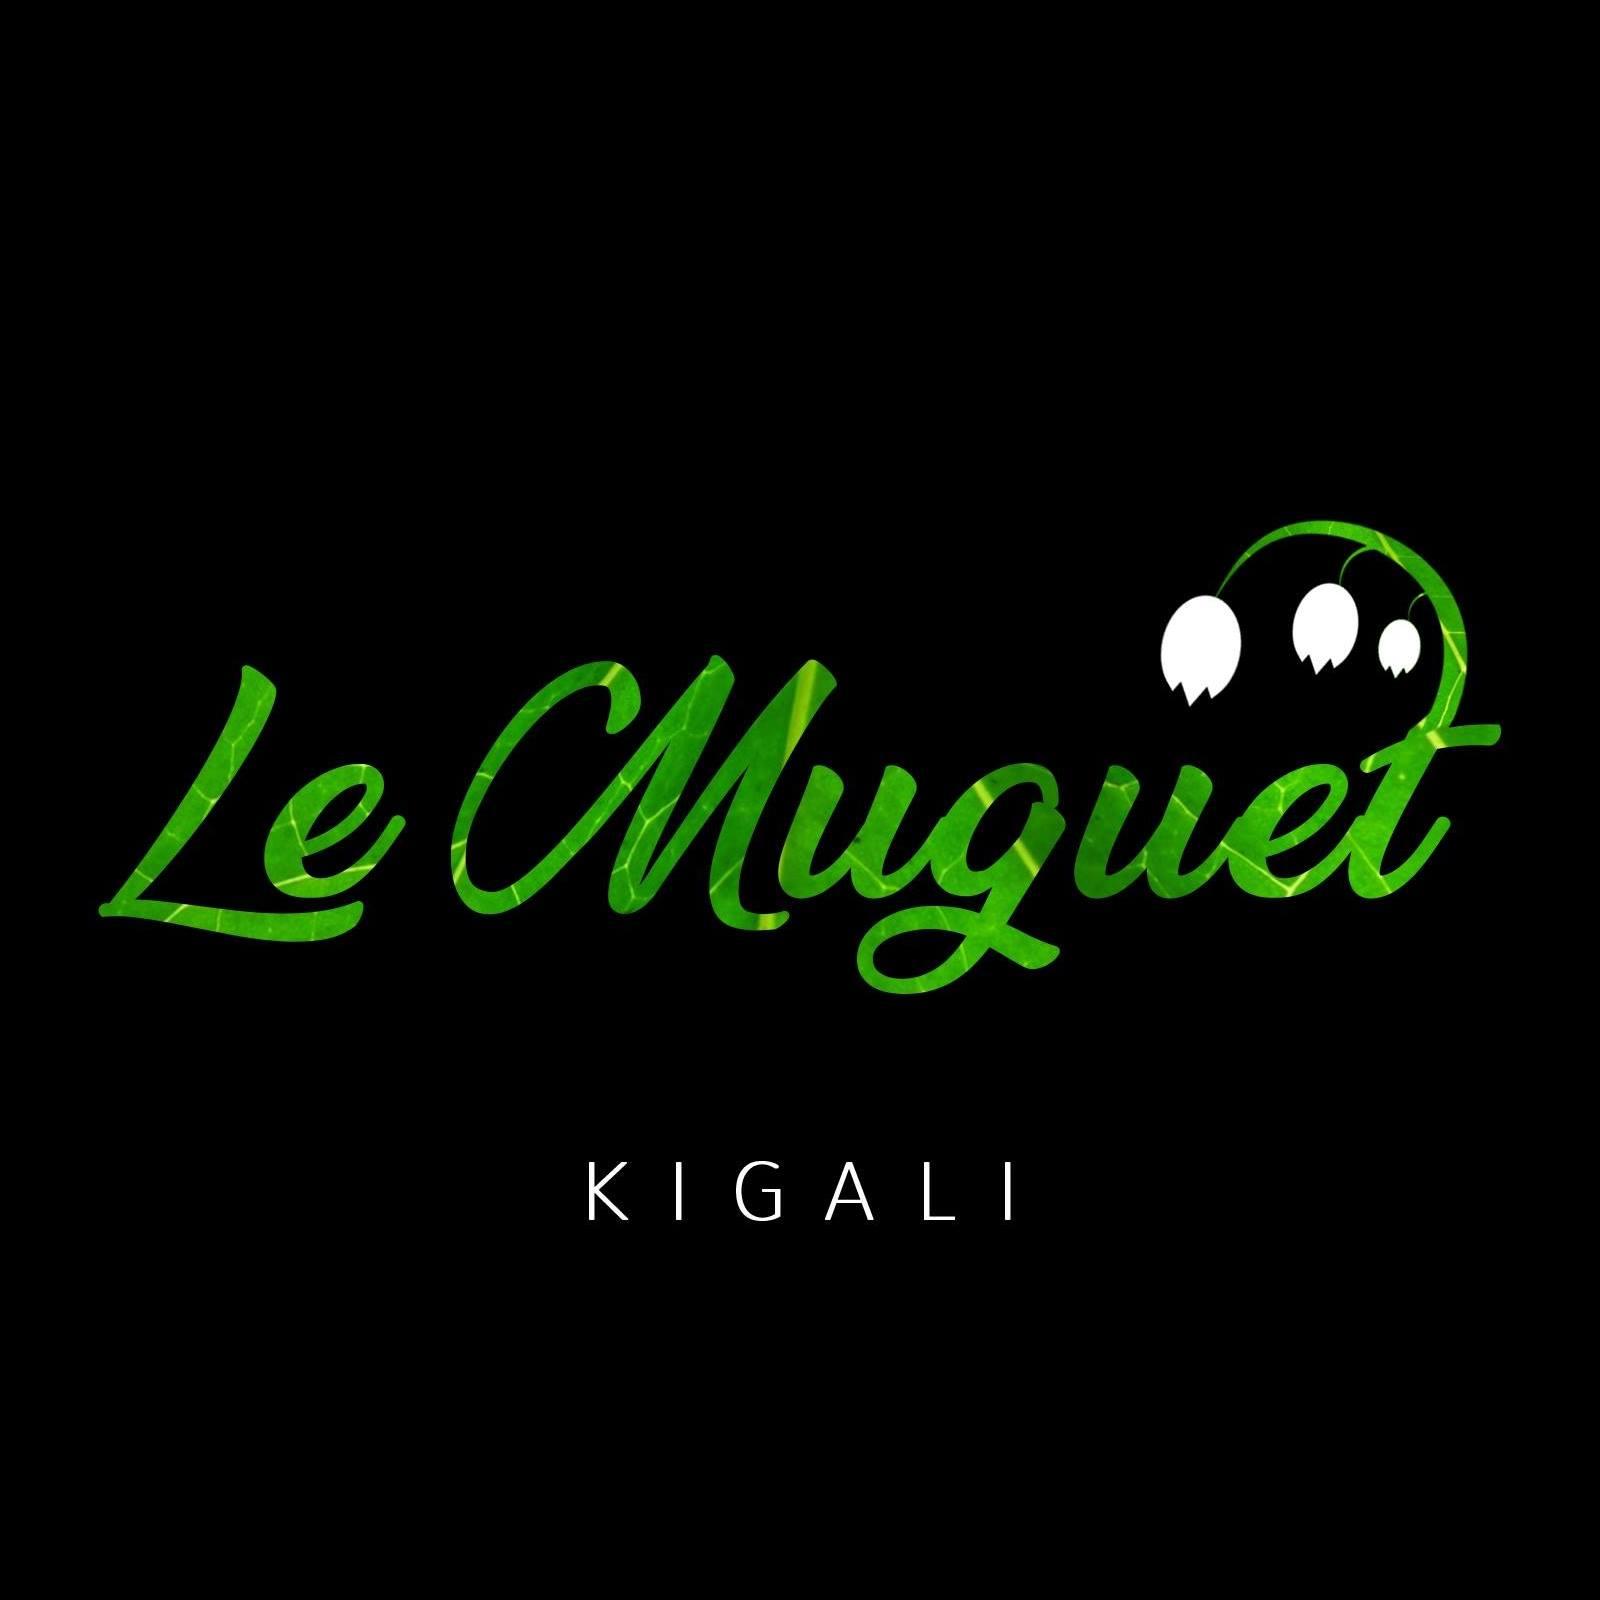 Le Muguet Kigali